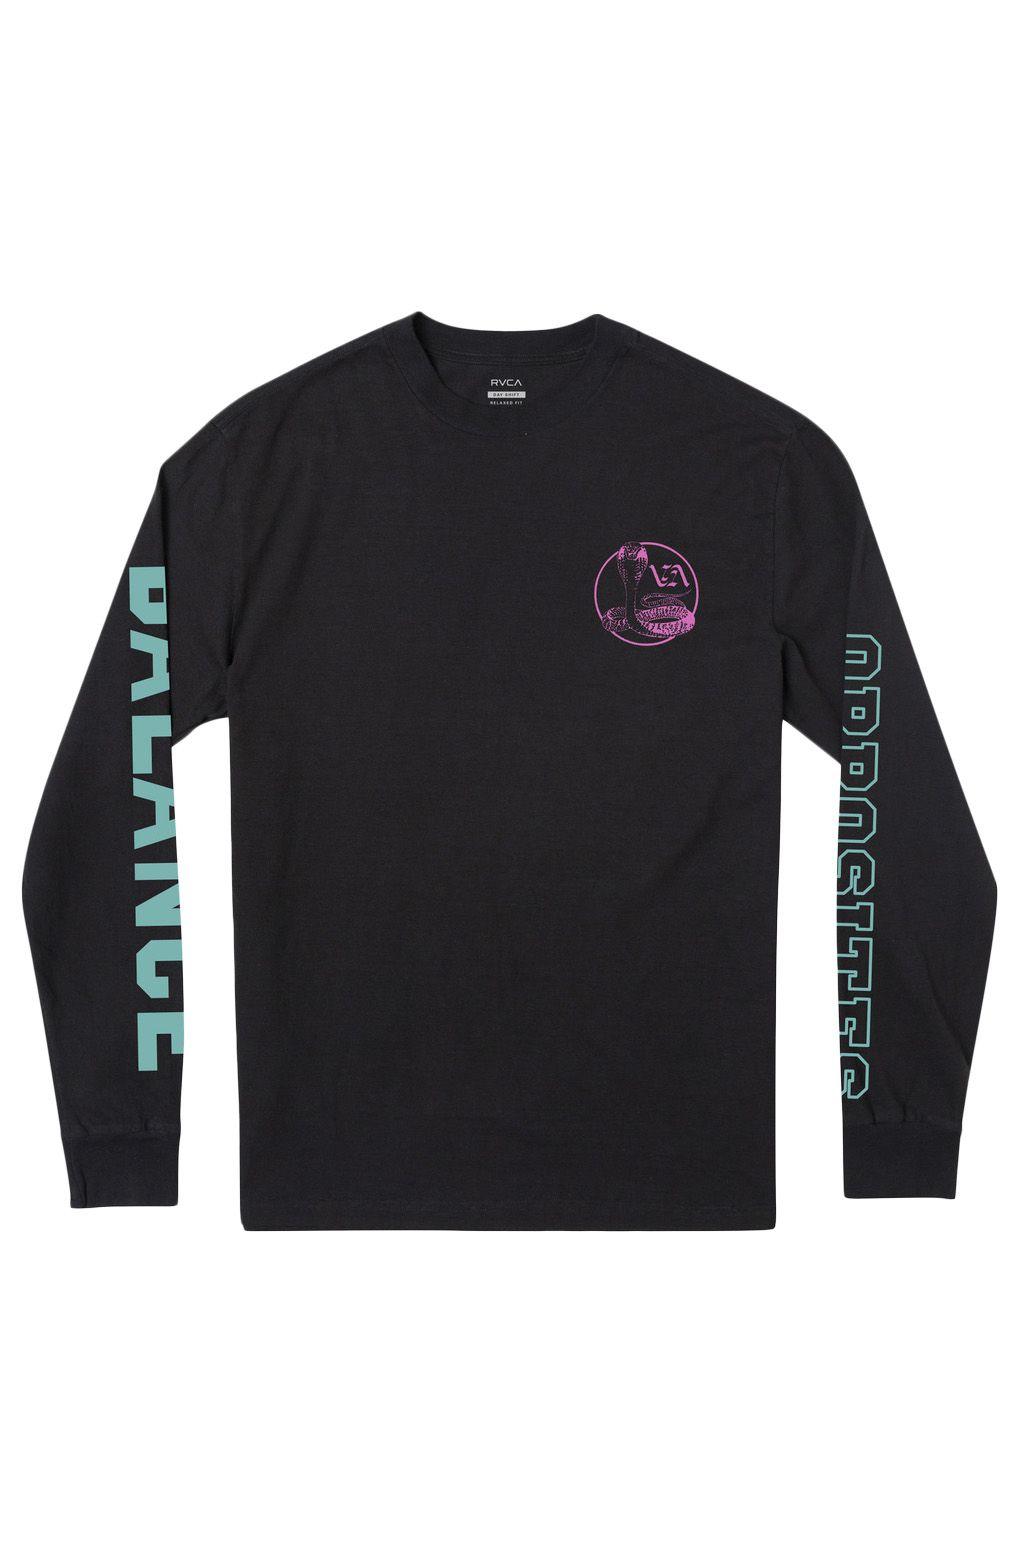 RVCA L-Sleeve COBRA UNIVERSITY LS Black